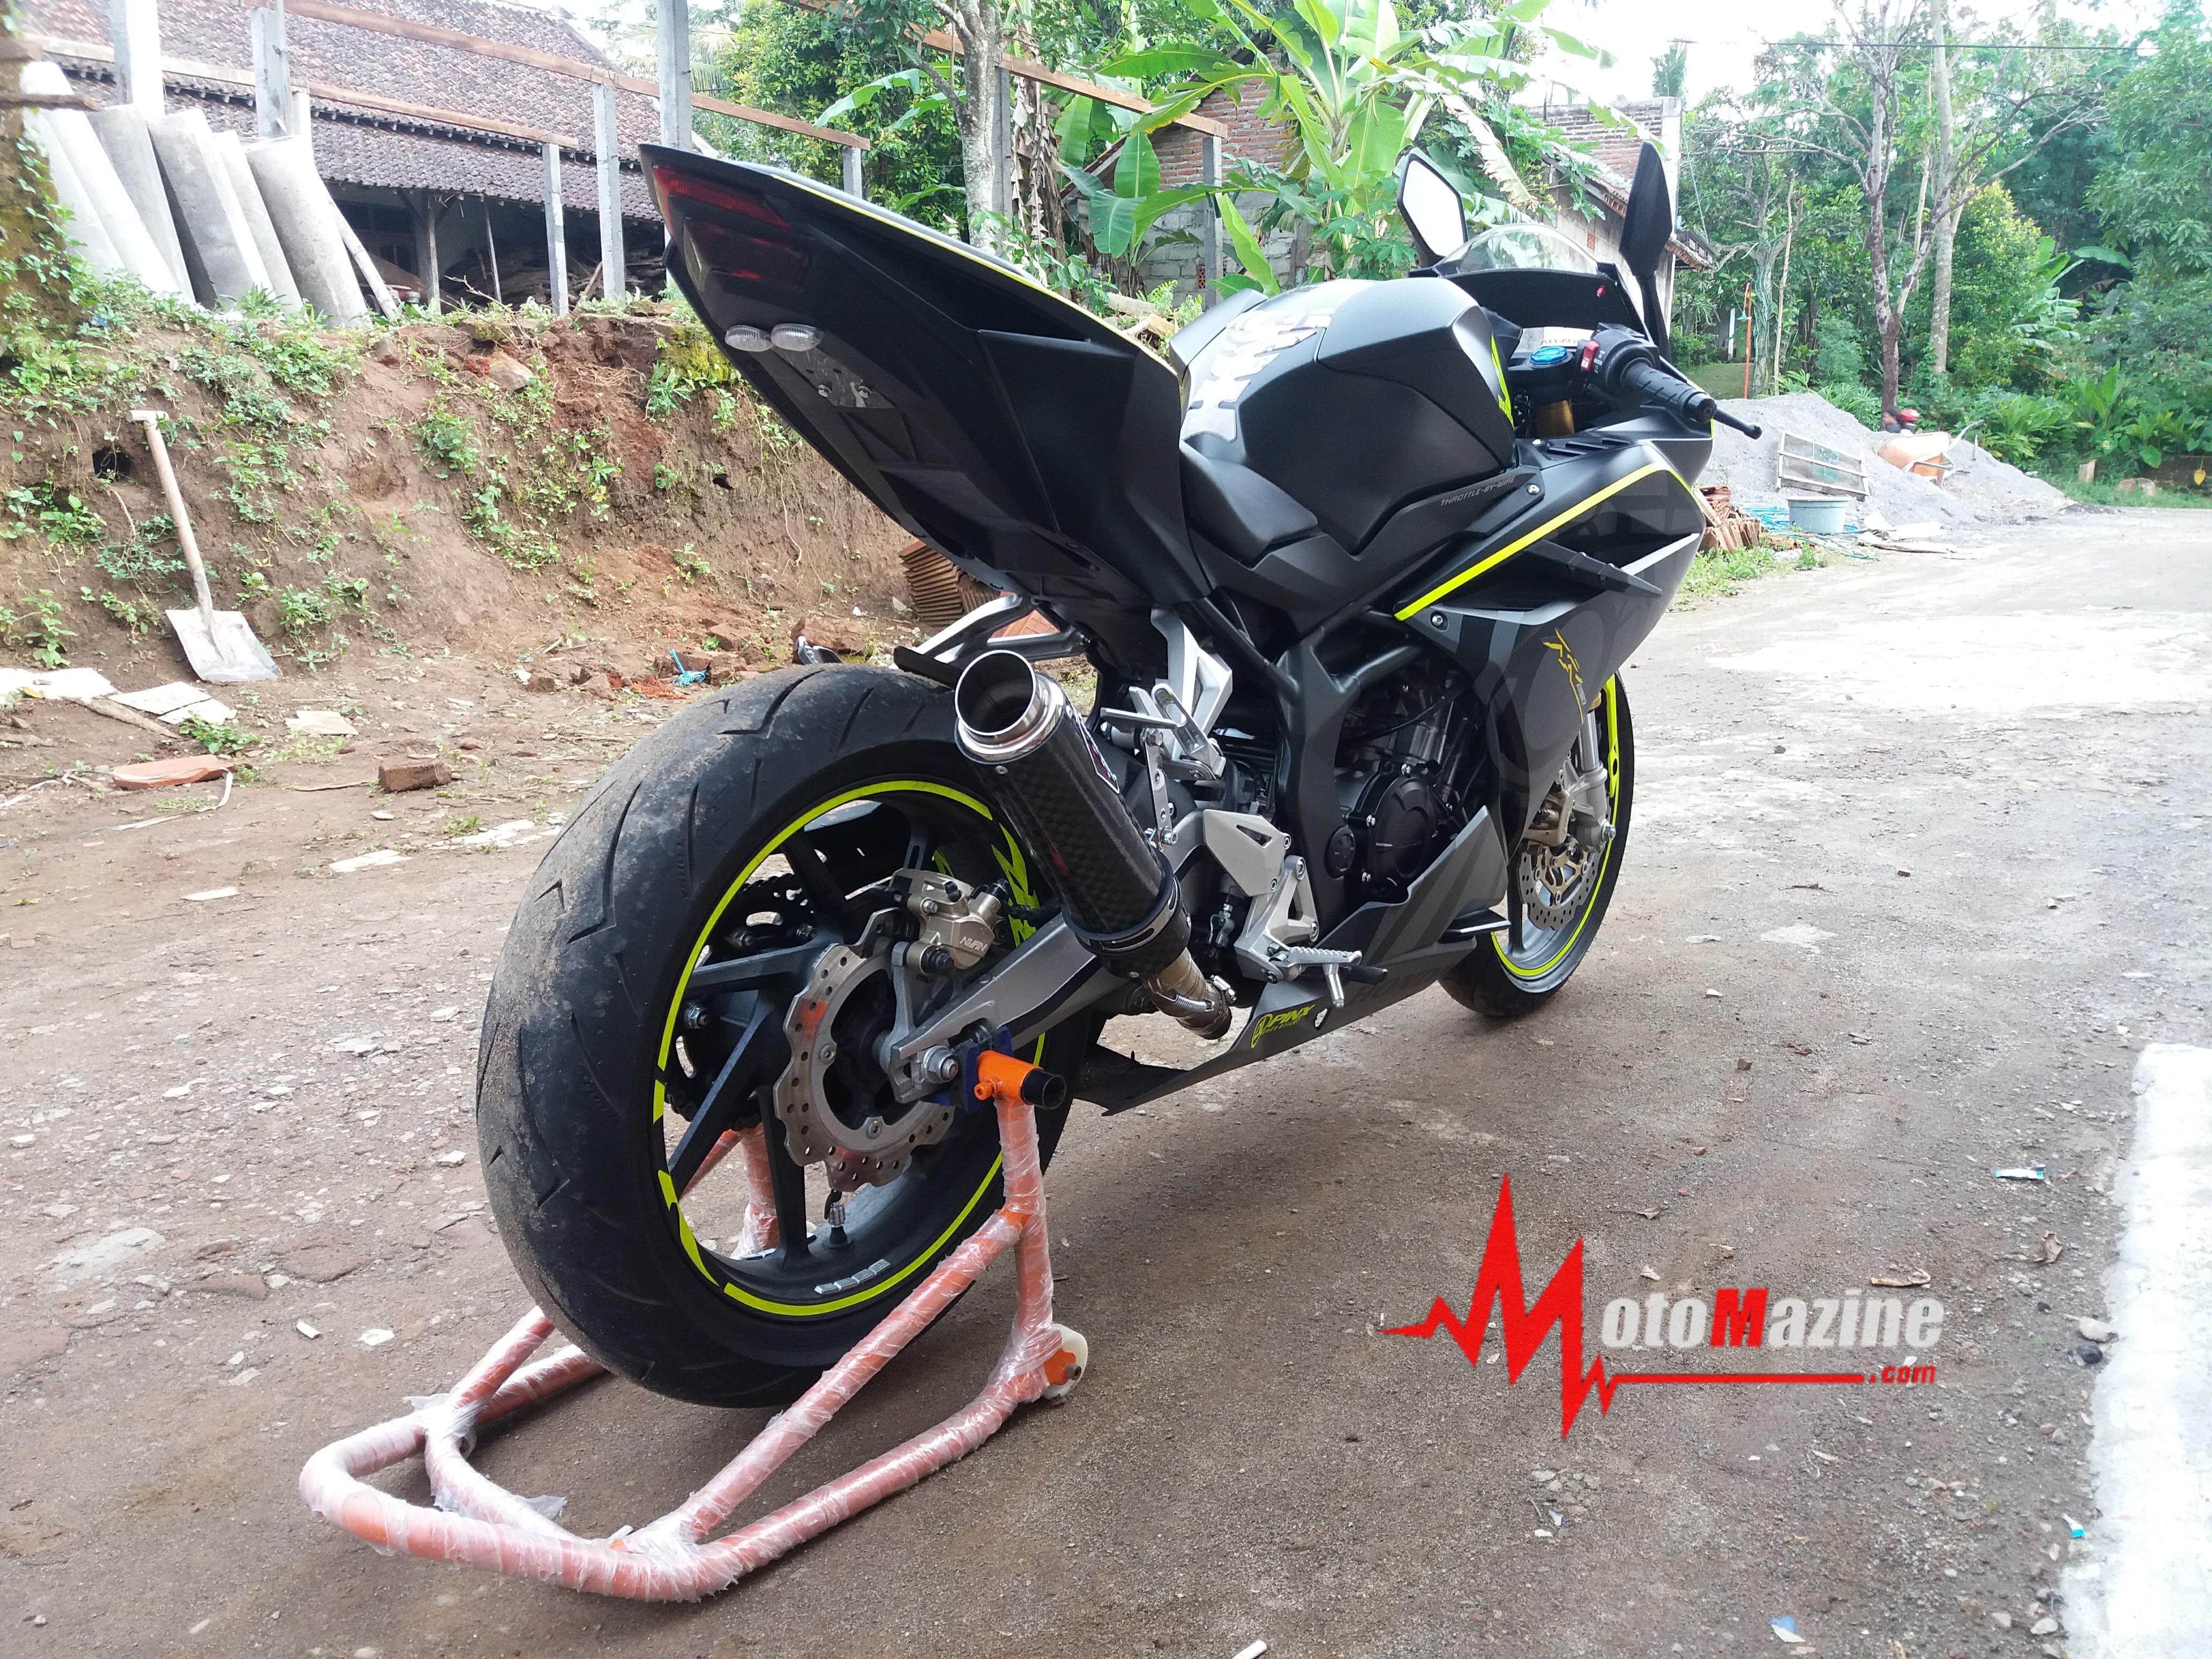 Modifikasi All New Honda CBR250RR Ala Yamaha M1 Rossi 2013 Awas